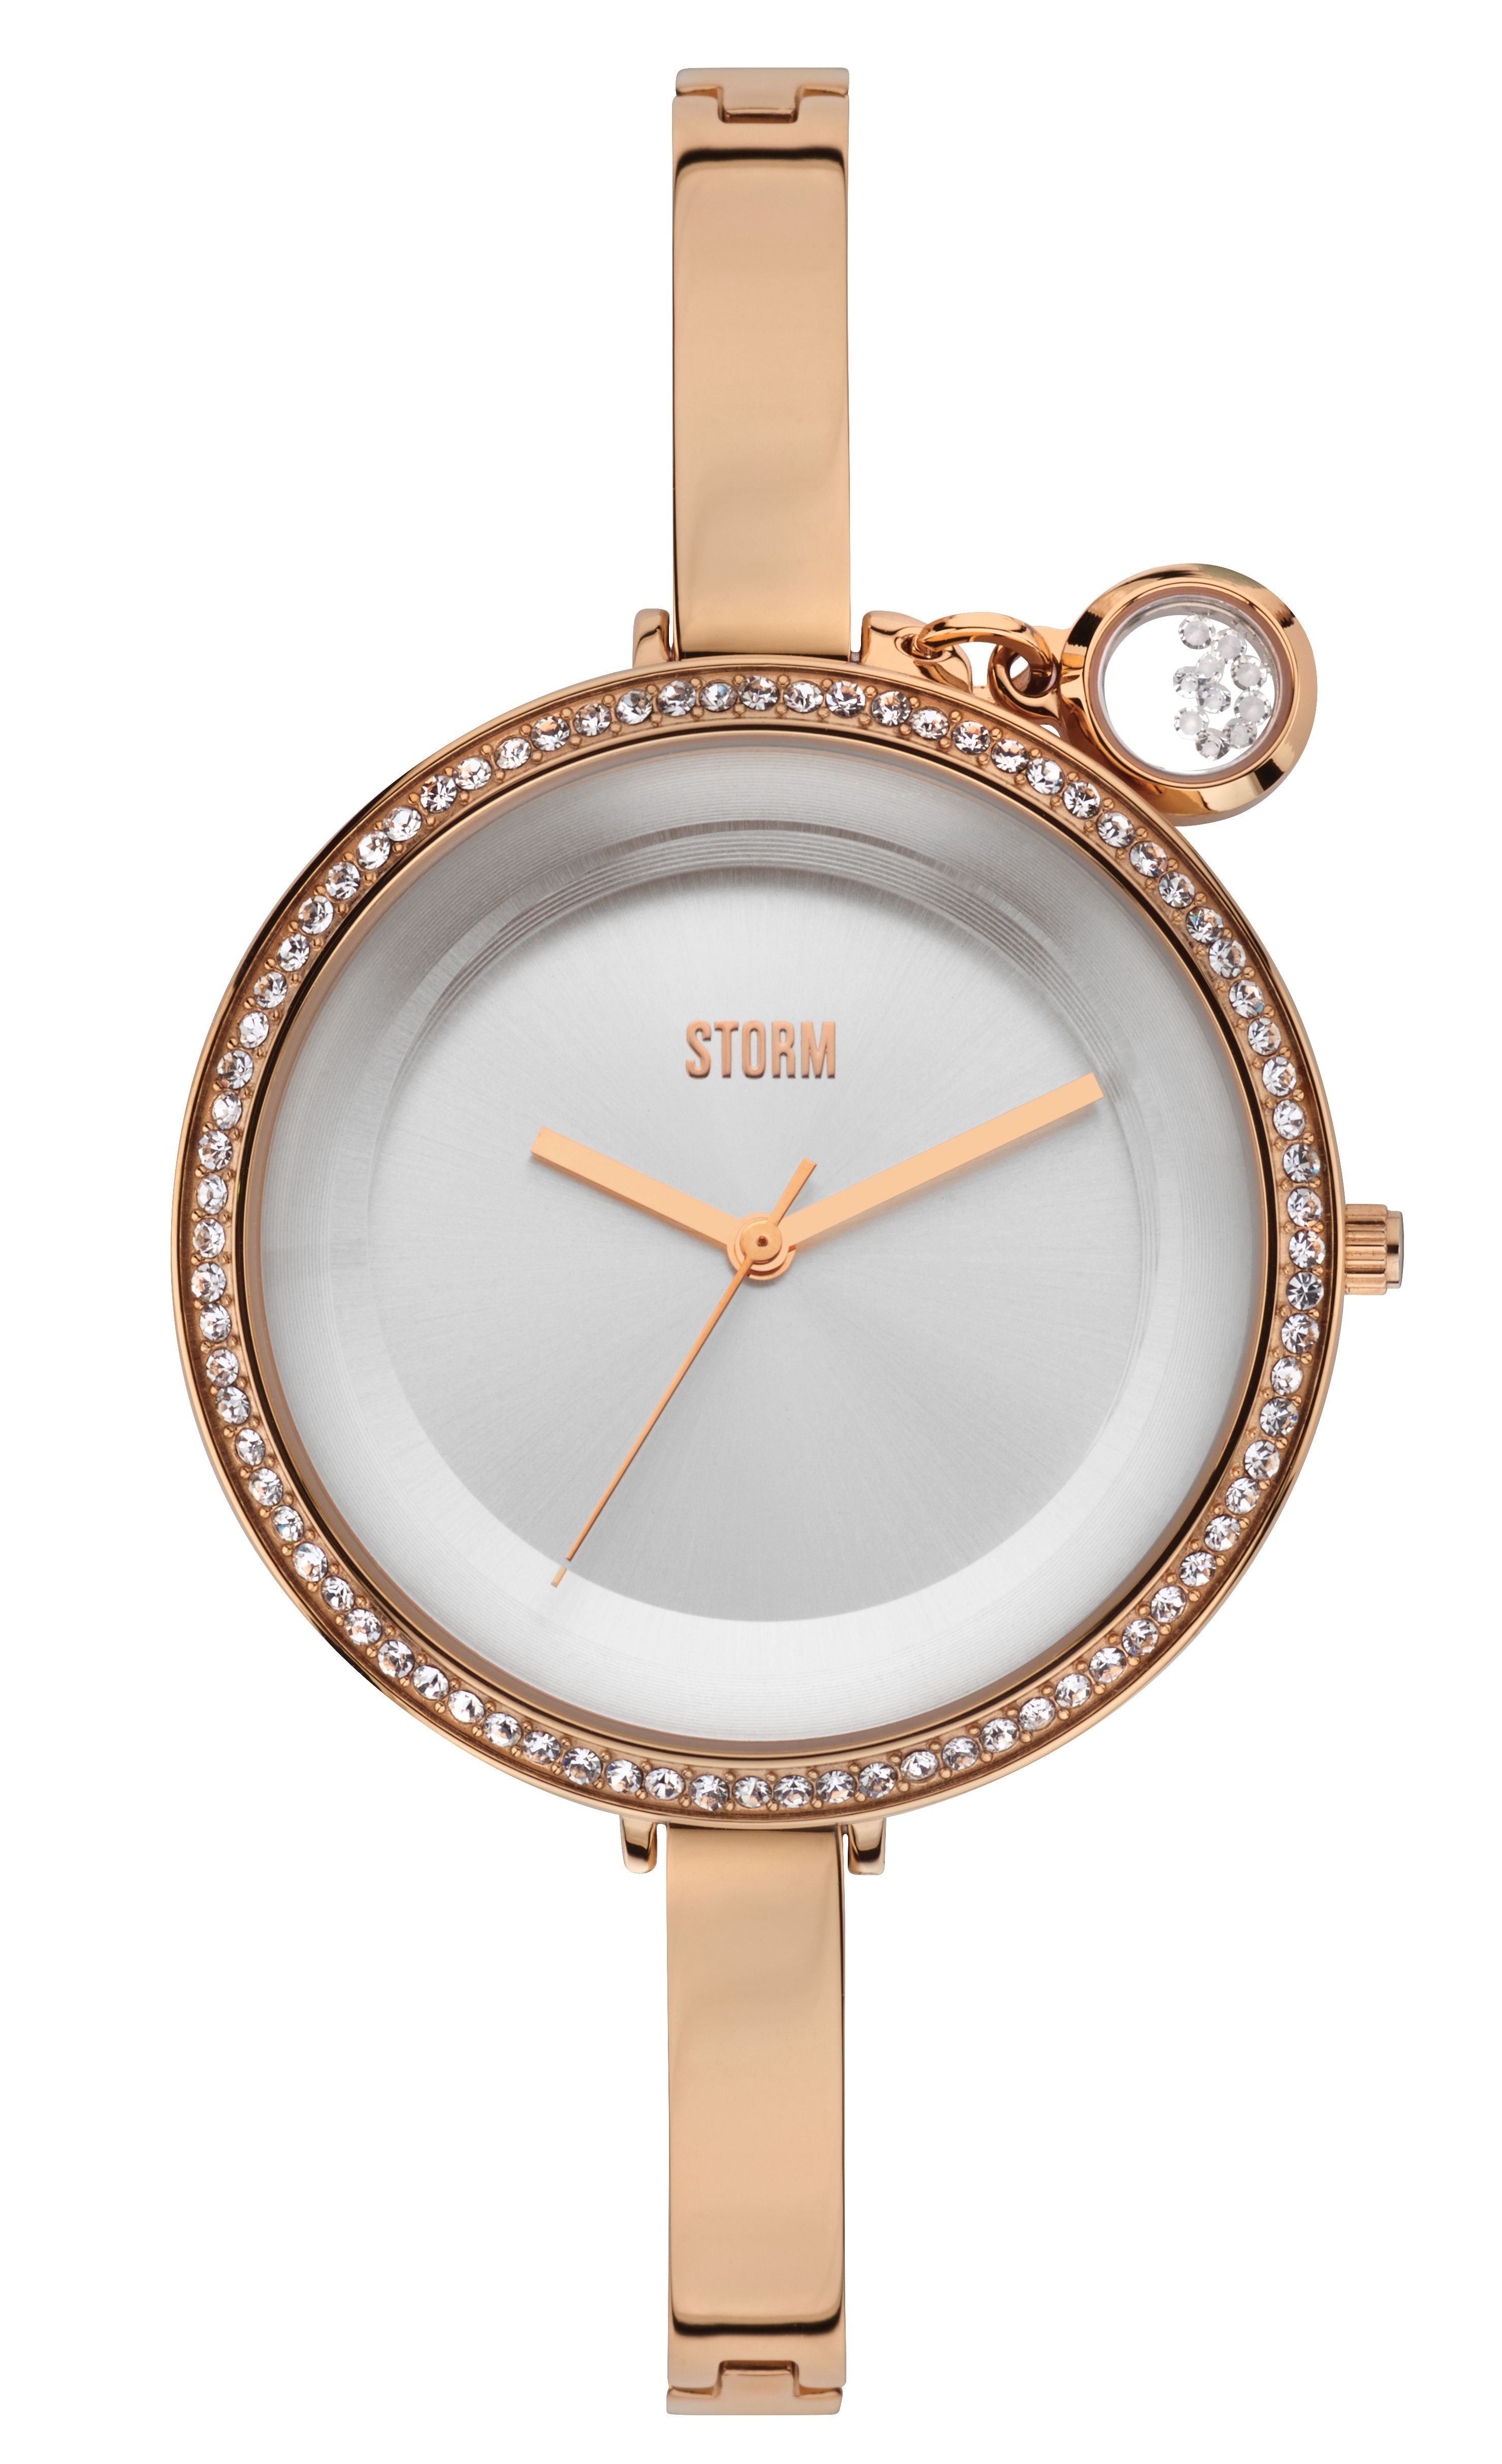 Storm Watch Hemera Rose Gold 47275/RG